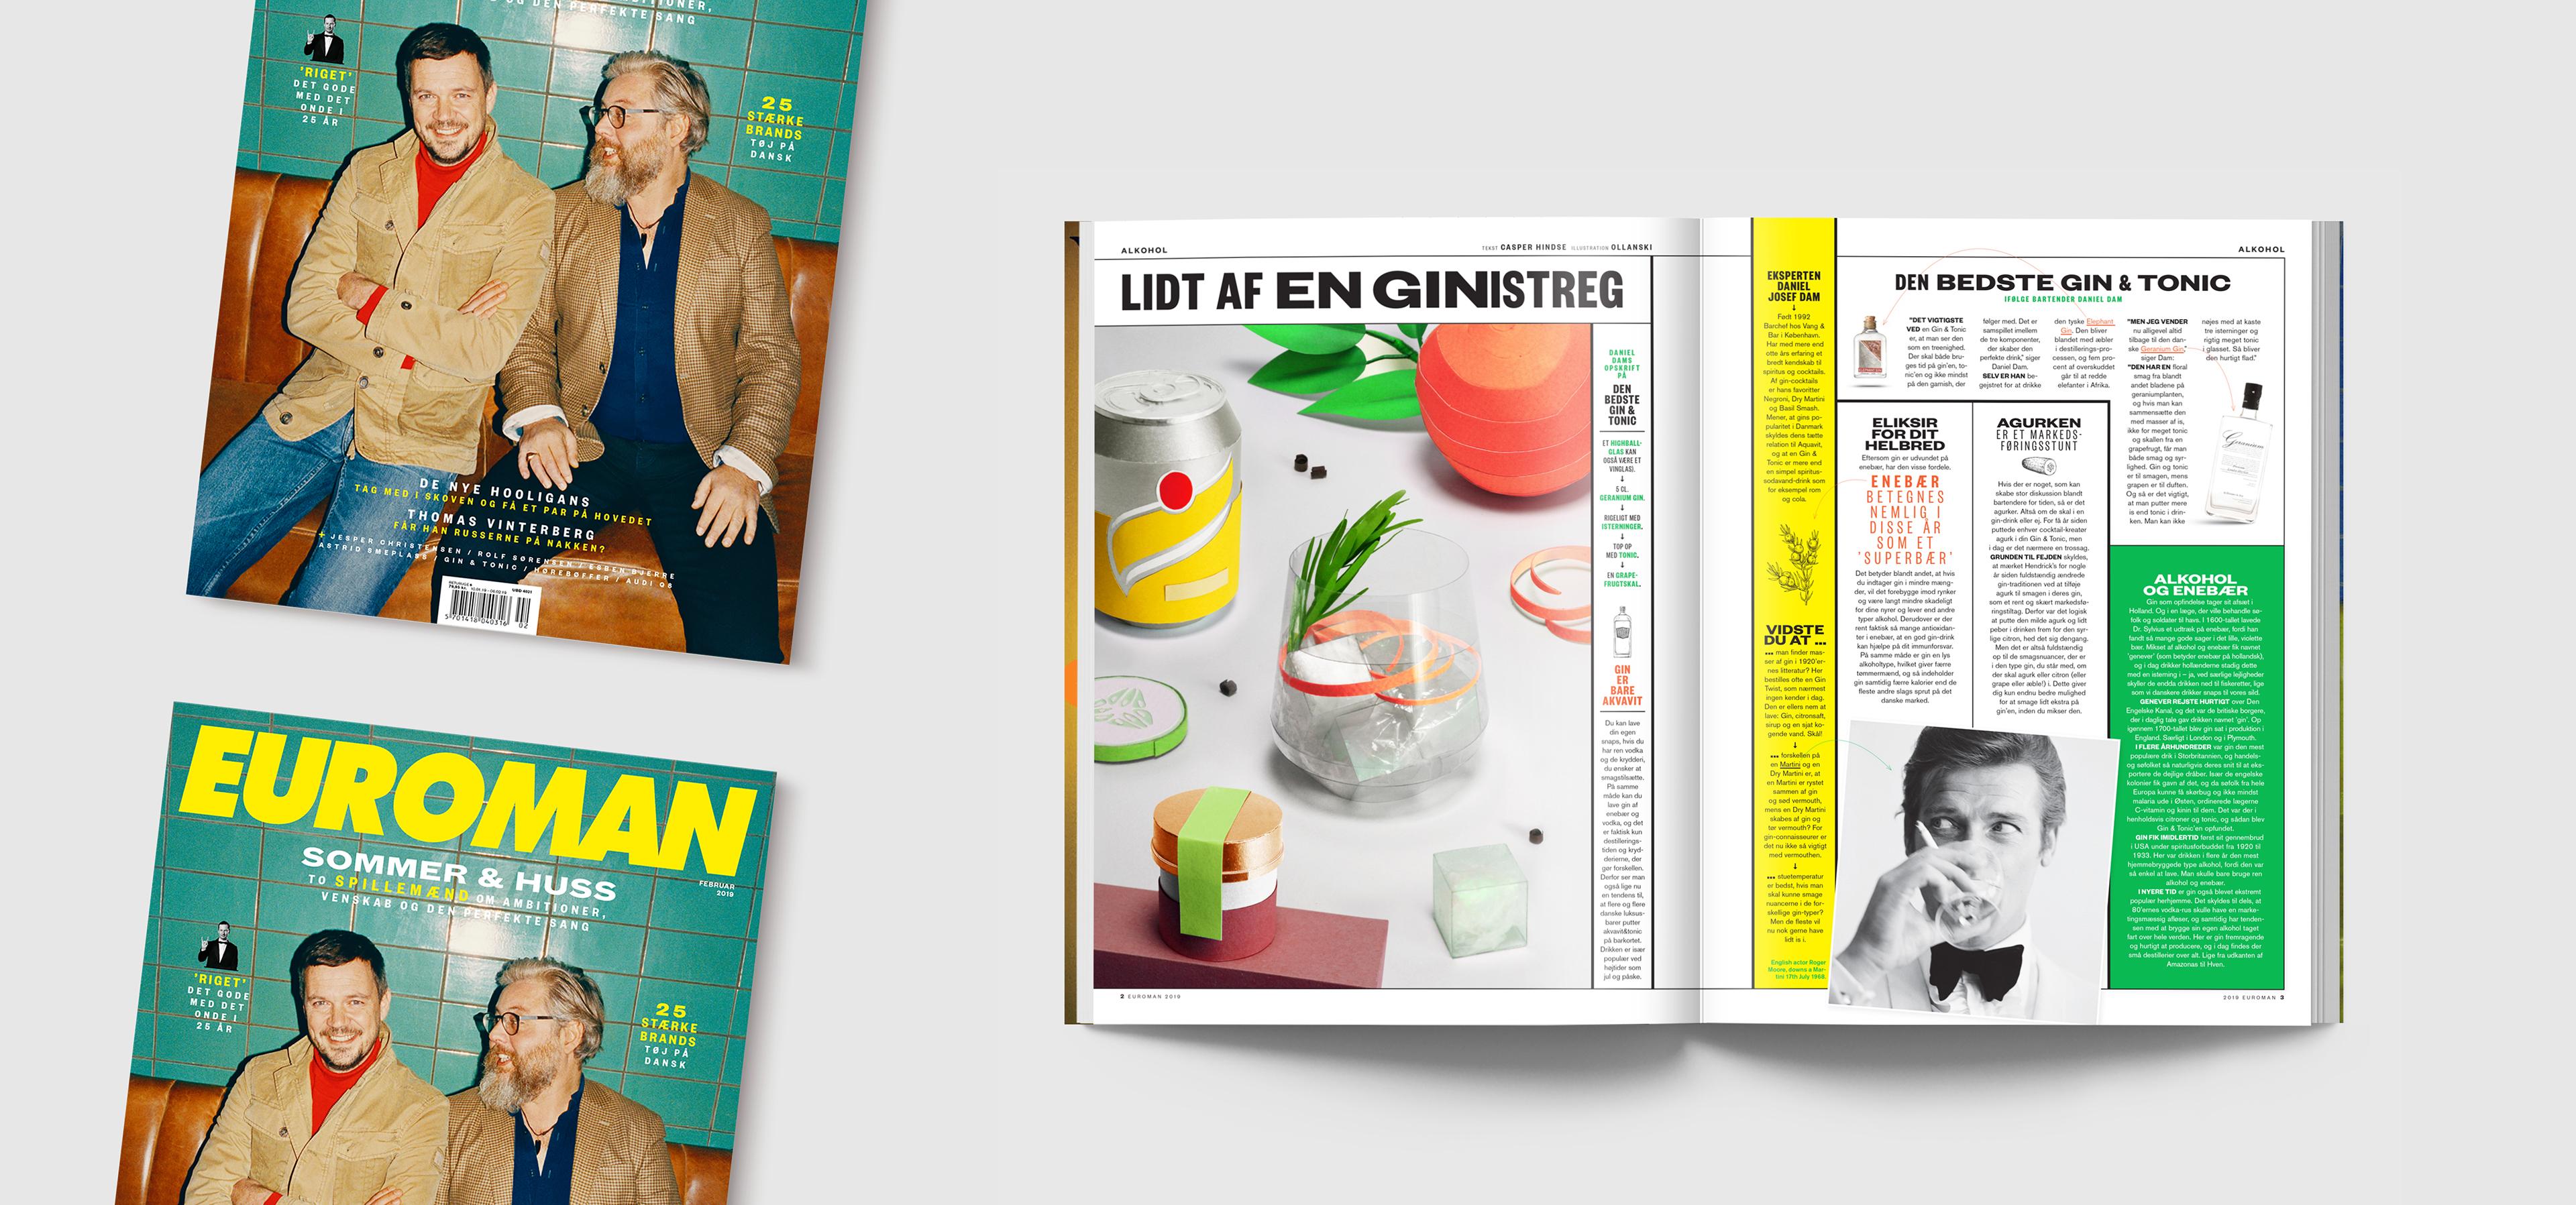 5d62e01173a4 EUROMAN magazine - Editorial Illustration on Behance